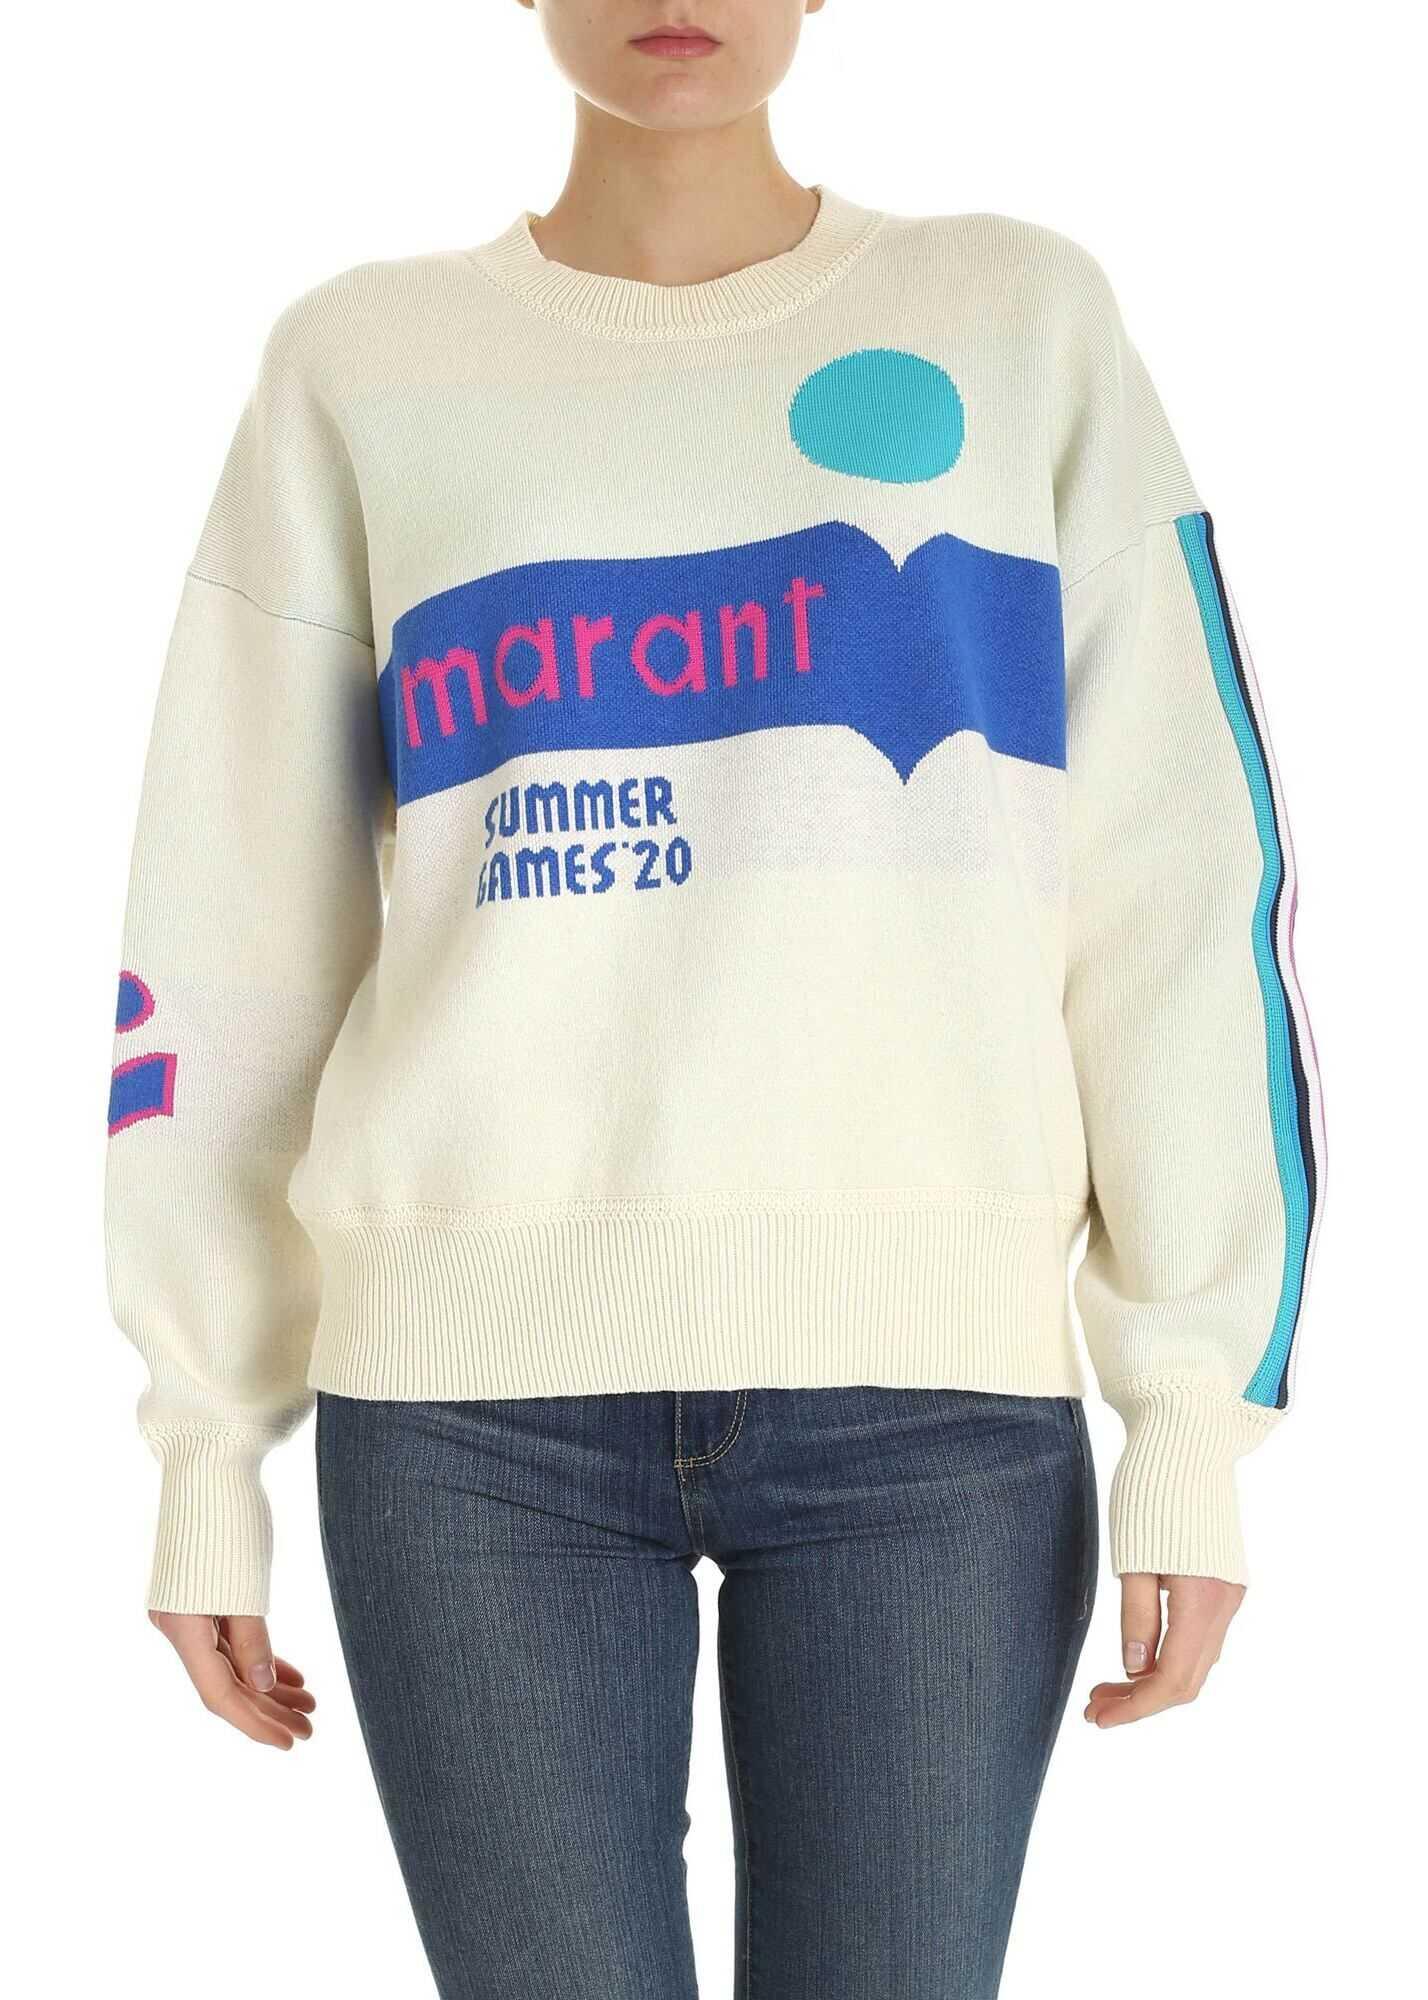 Isabel Marant Kleden Pullover In Cream Color Cream